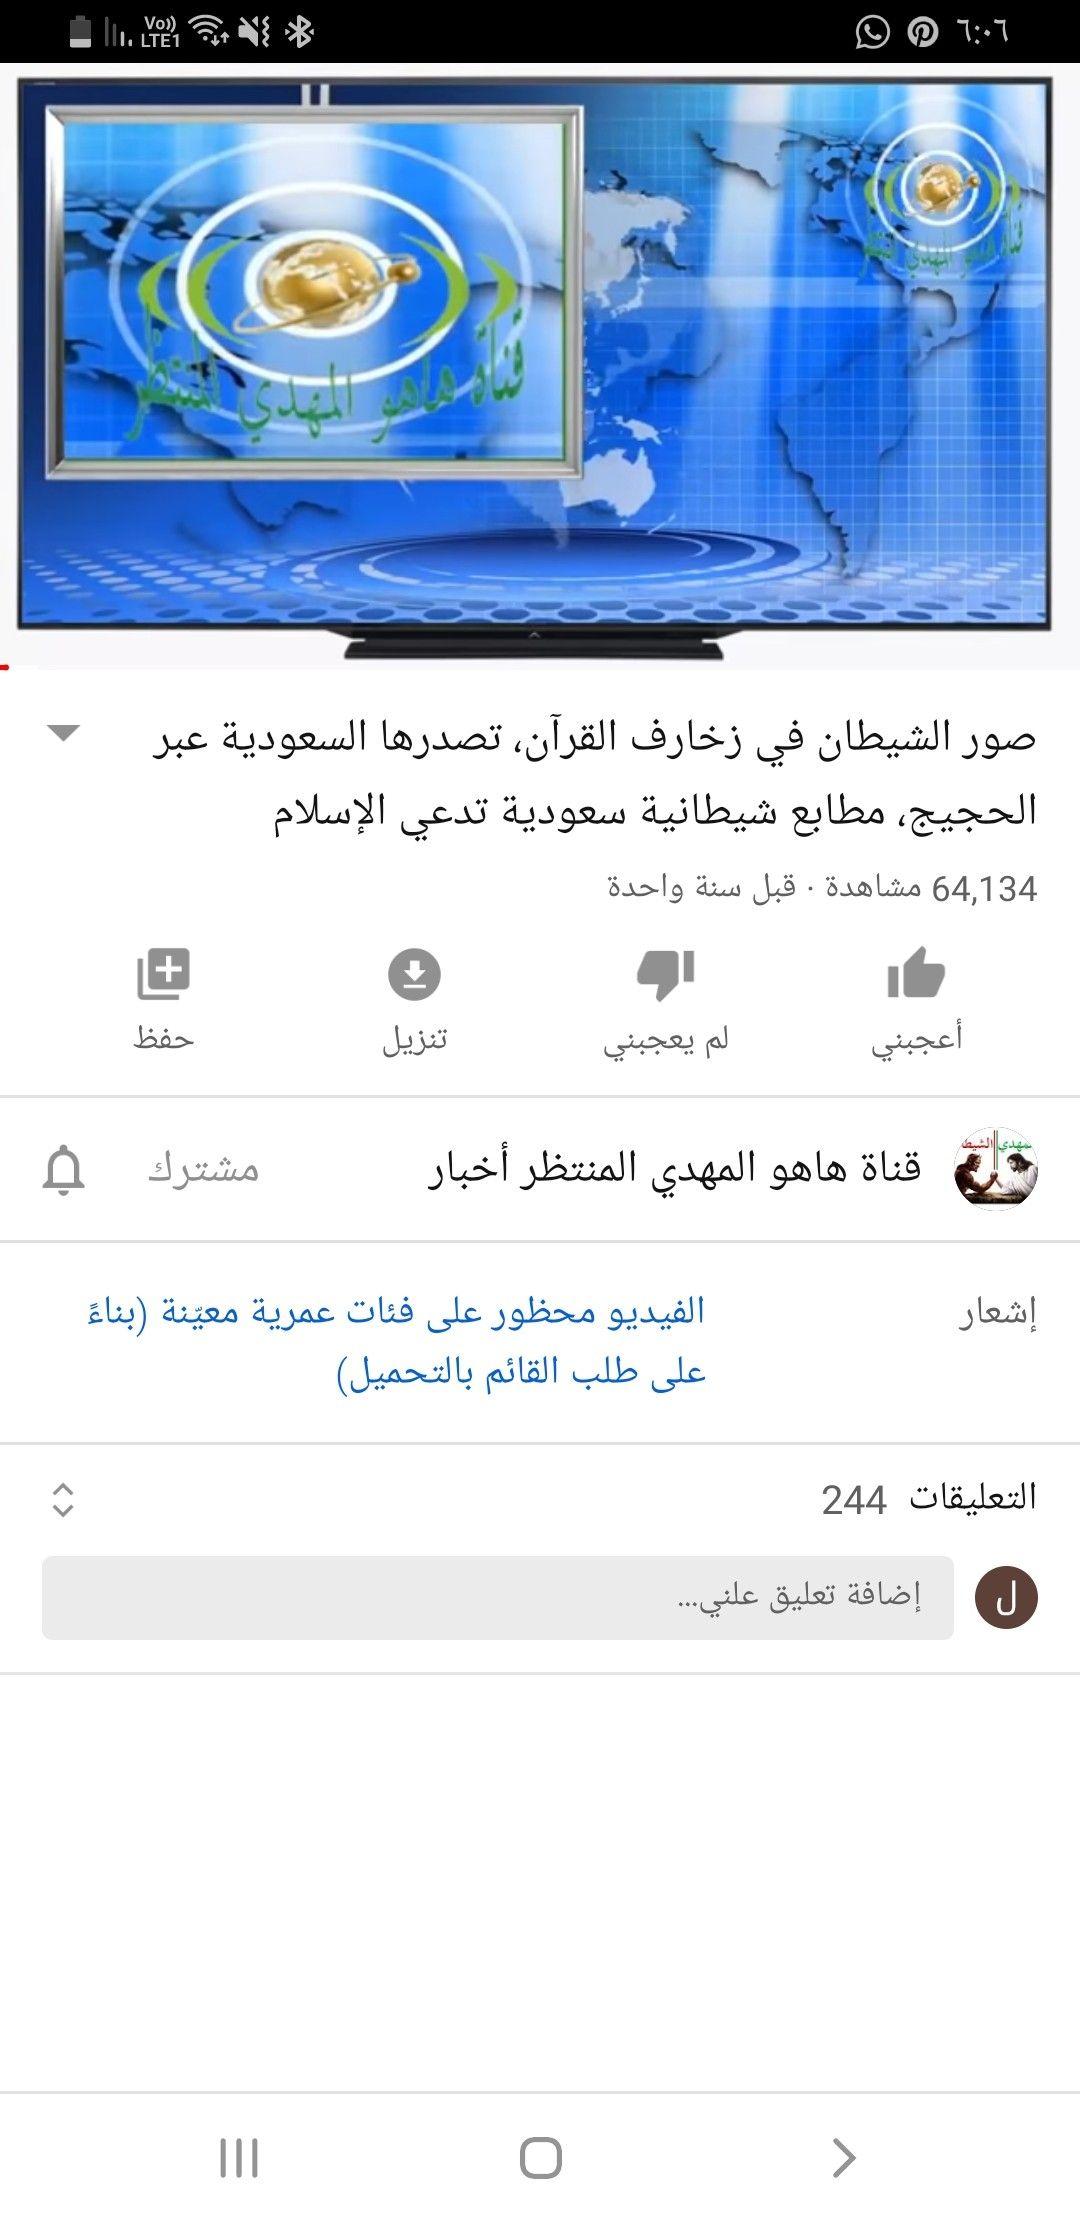 Pin By علوش توب ان شاء الله On صور الشيطان في زخارف القران بمطابع السعودية Starry Night Artwork Pandora Screenshot